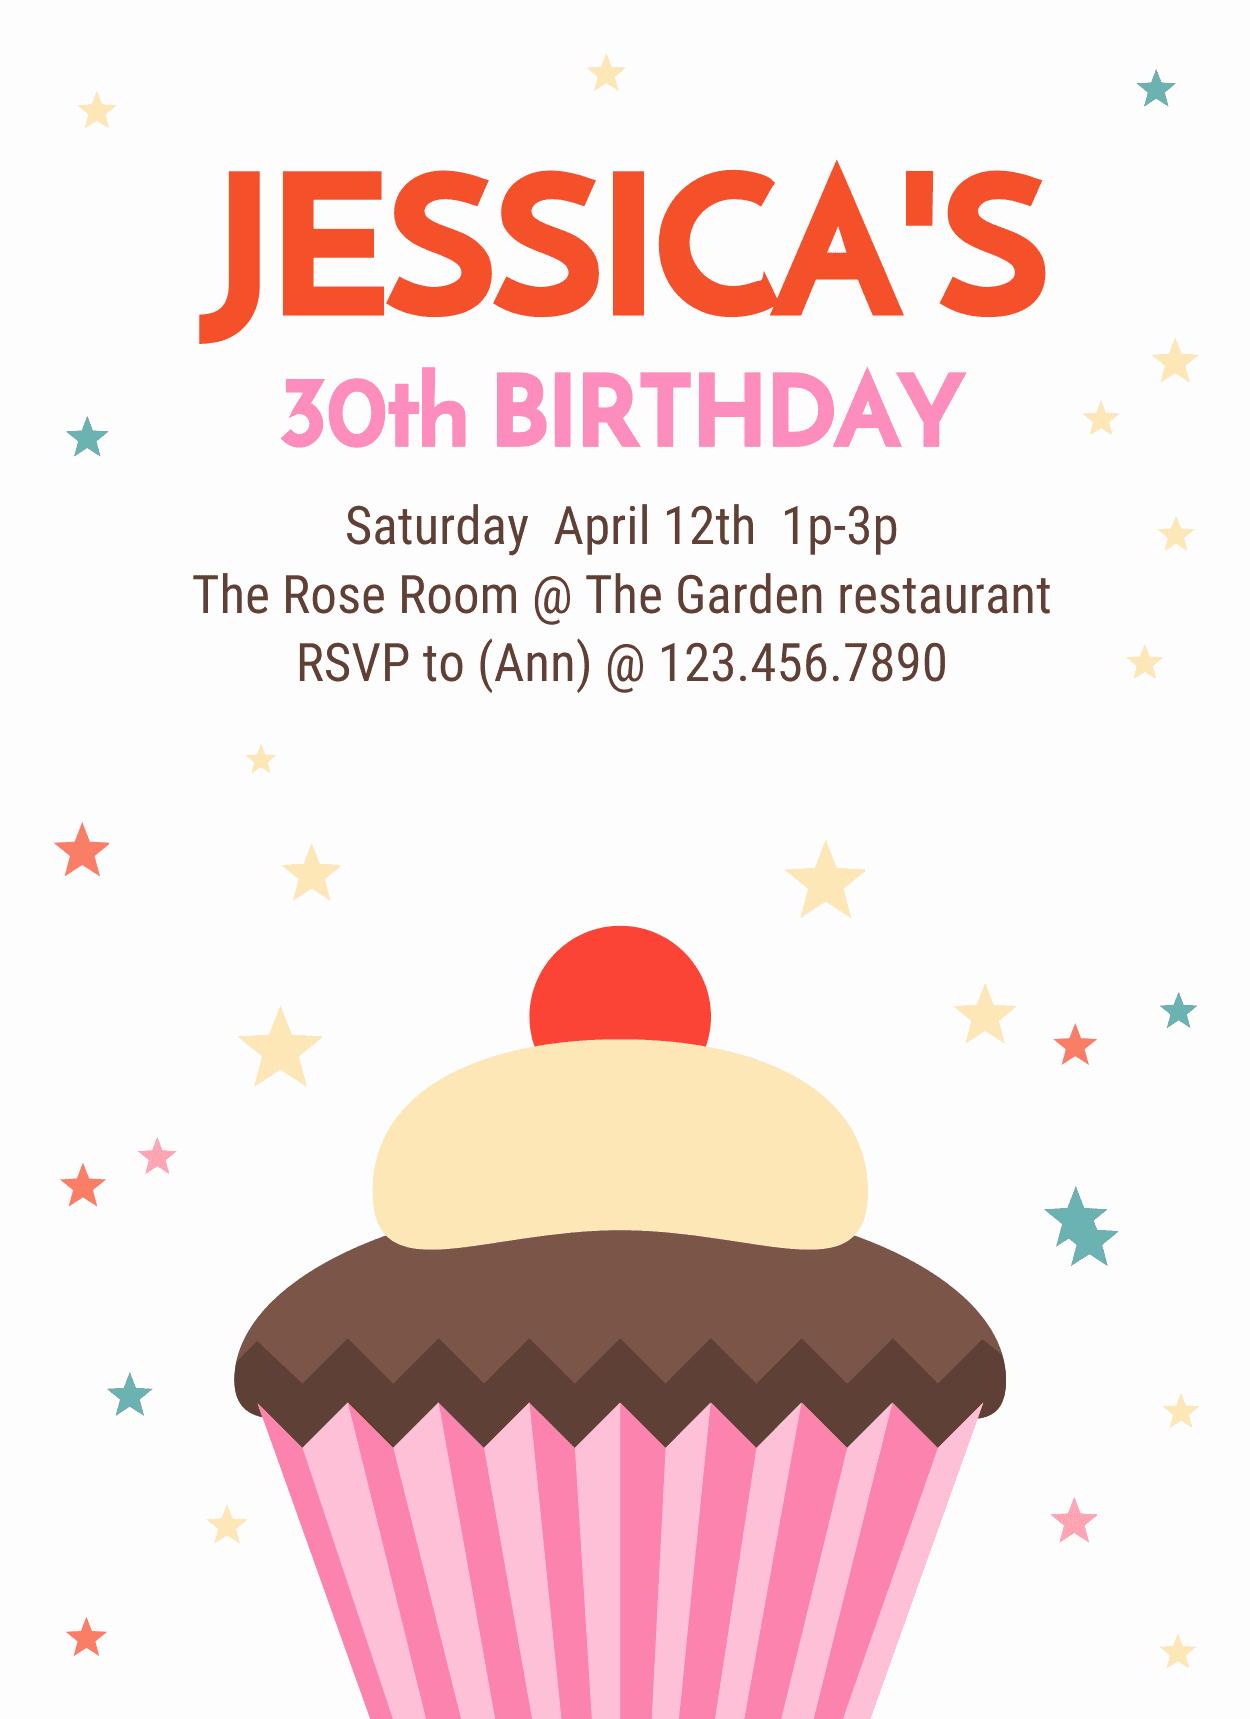 Birthday Invitation Card Template Beautiful 10 Creative Birthday Invitation Card Design Tips